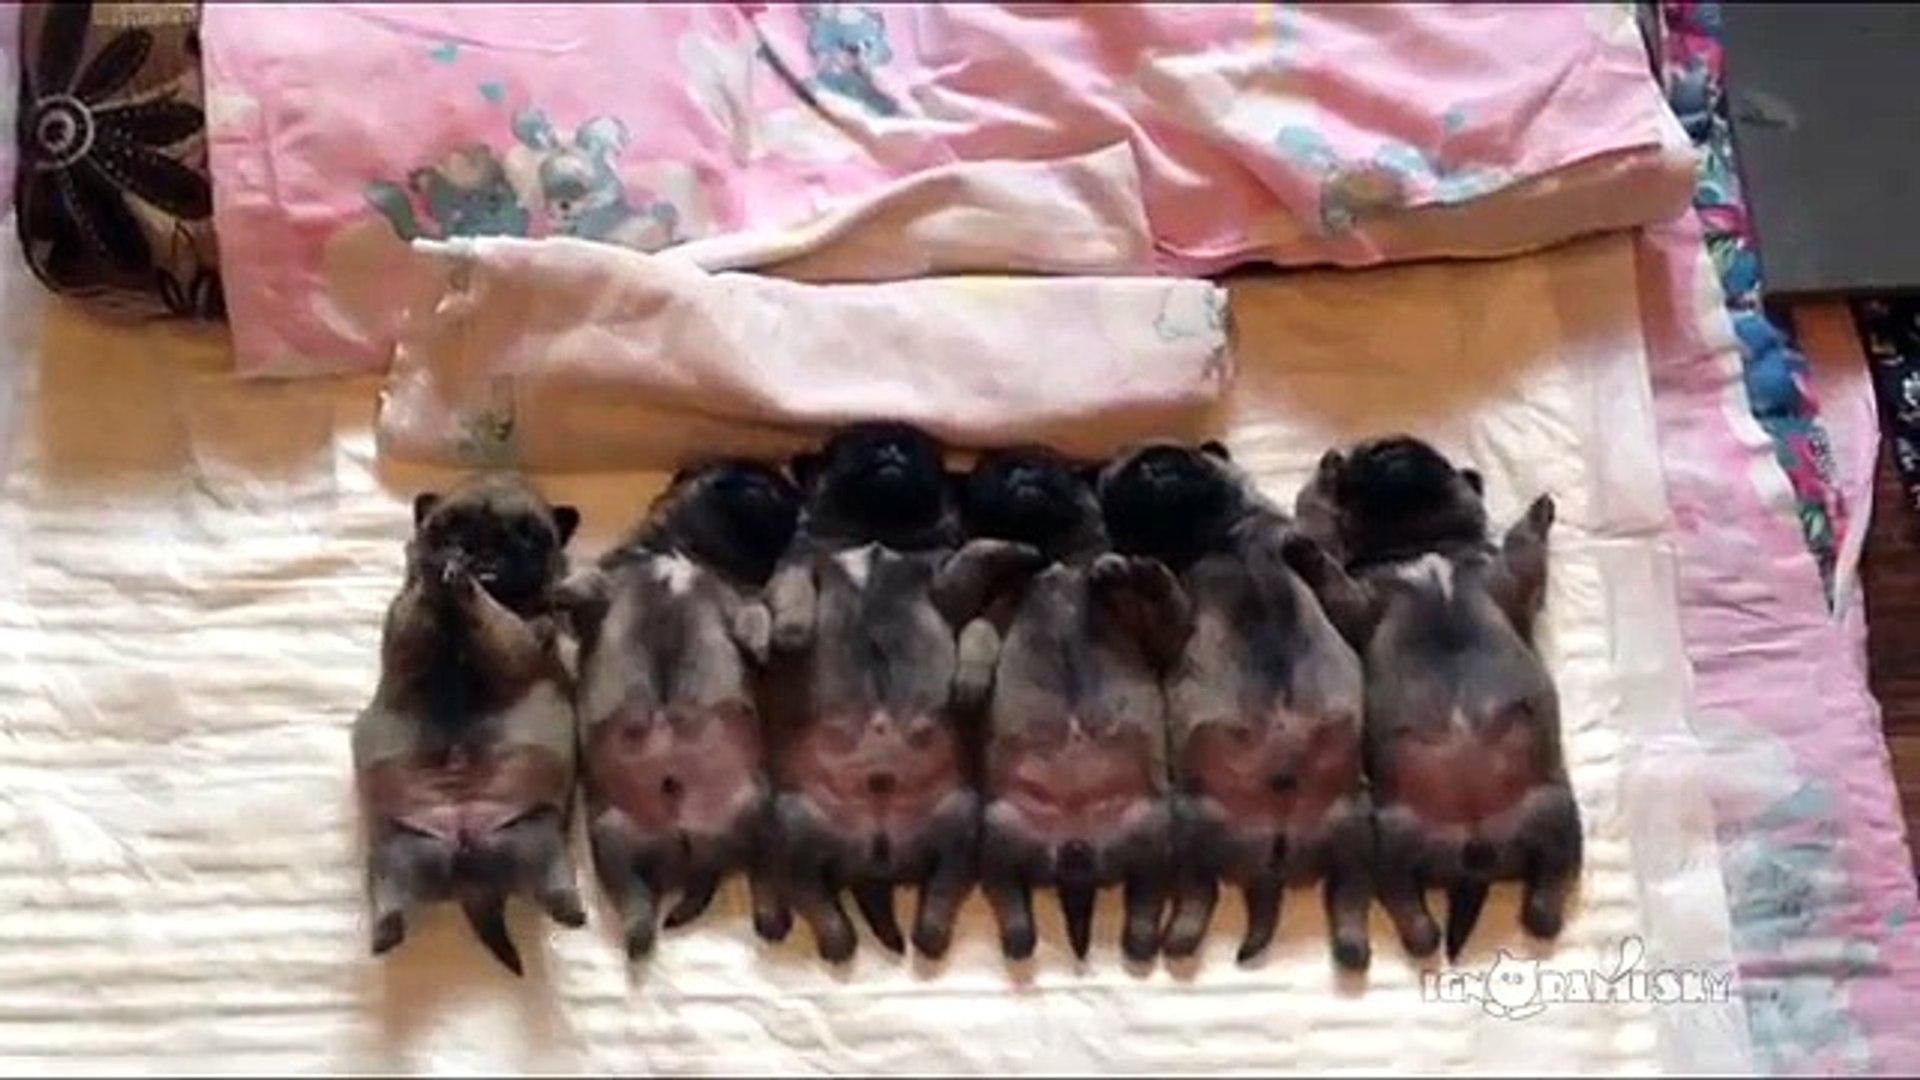 Line of sleeping  puppies (pugs) - Уснувший в ряд мопсов отряд